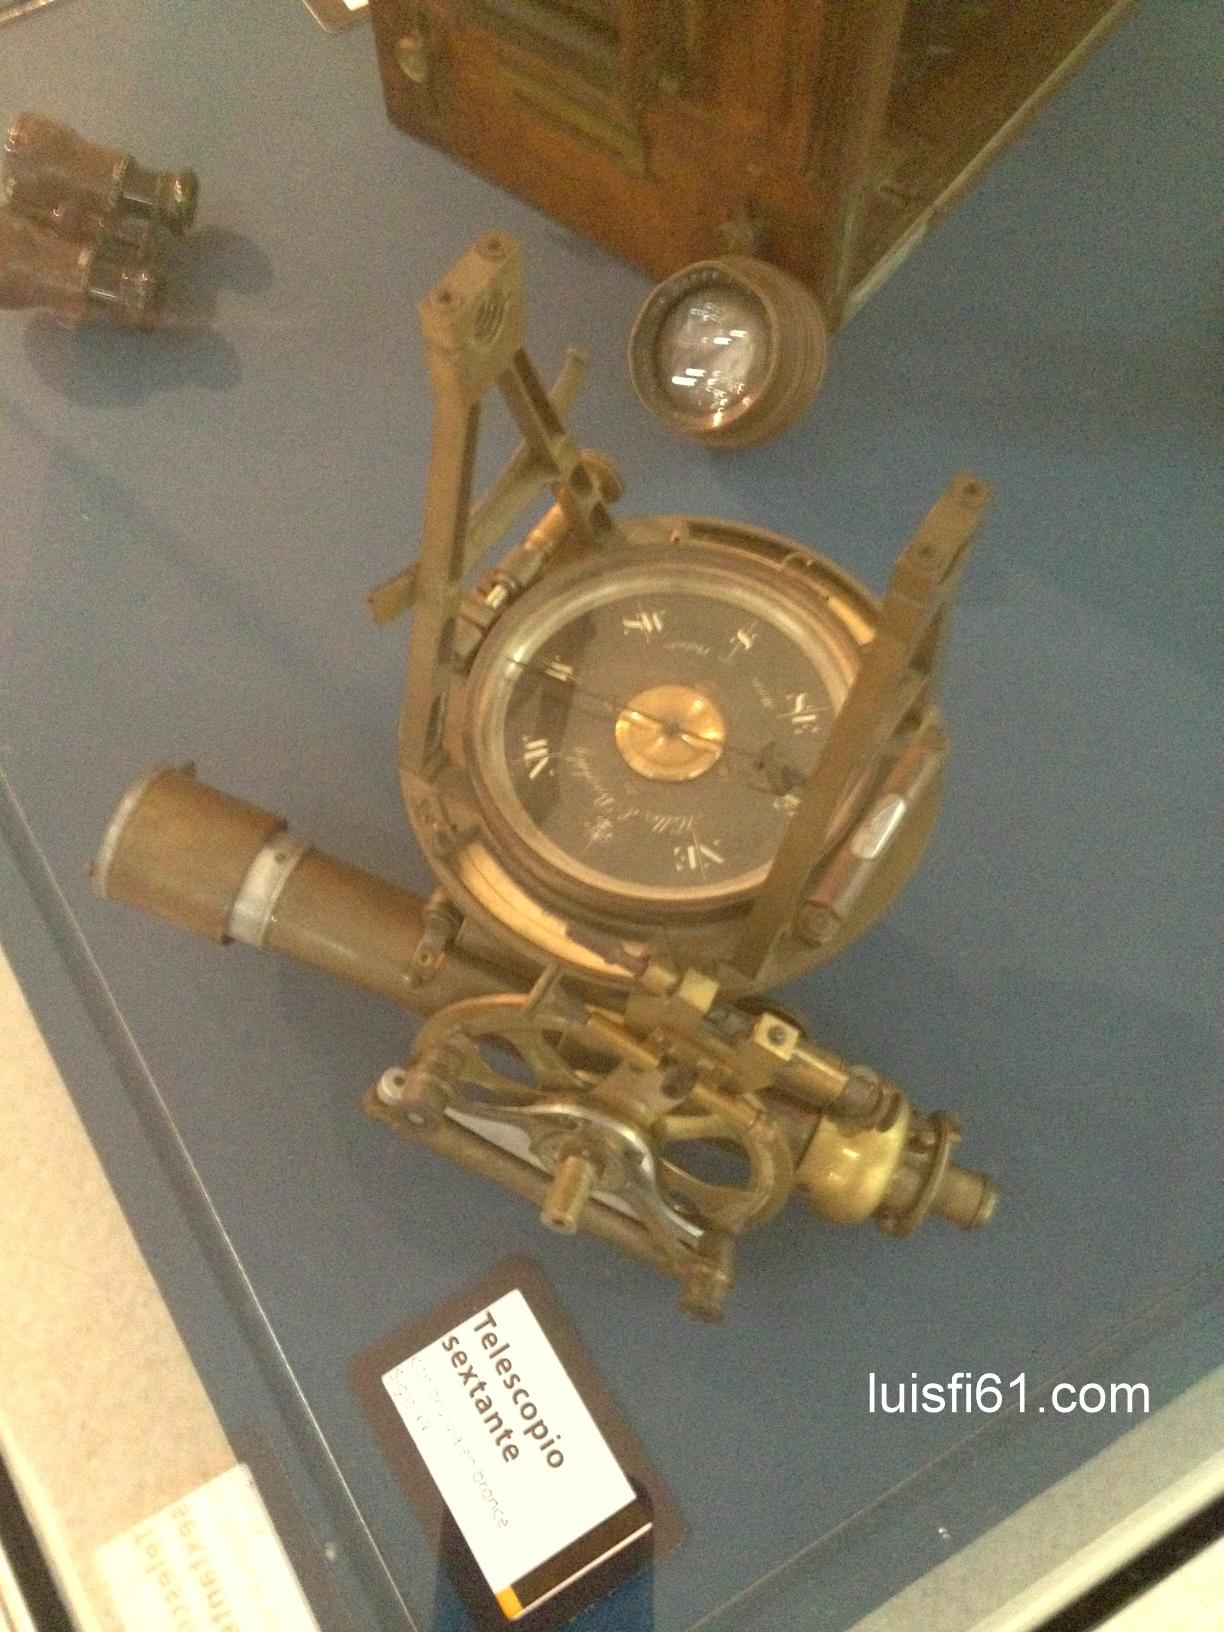 151104-telescopio-sextante-claudio-urrutia-luis-figueroa